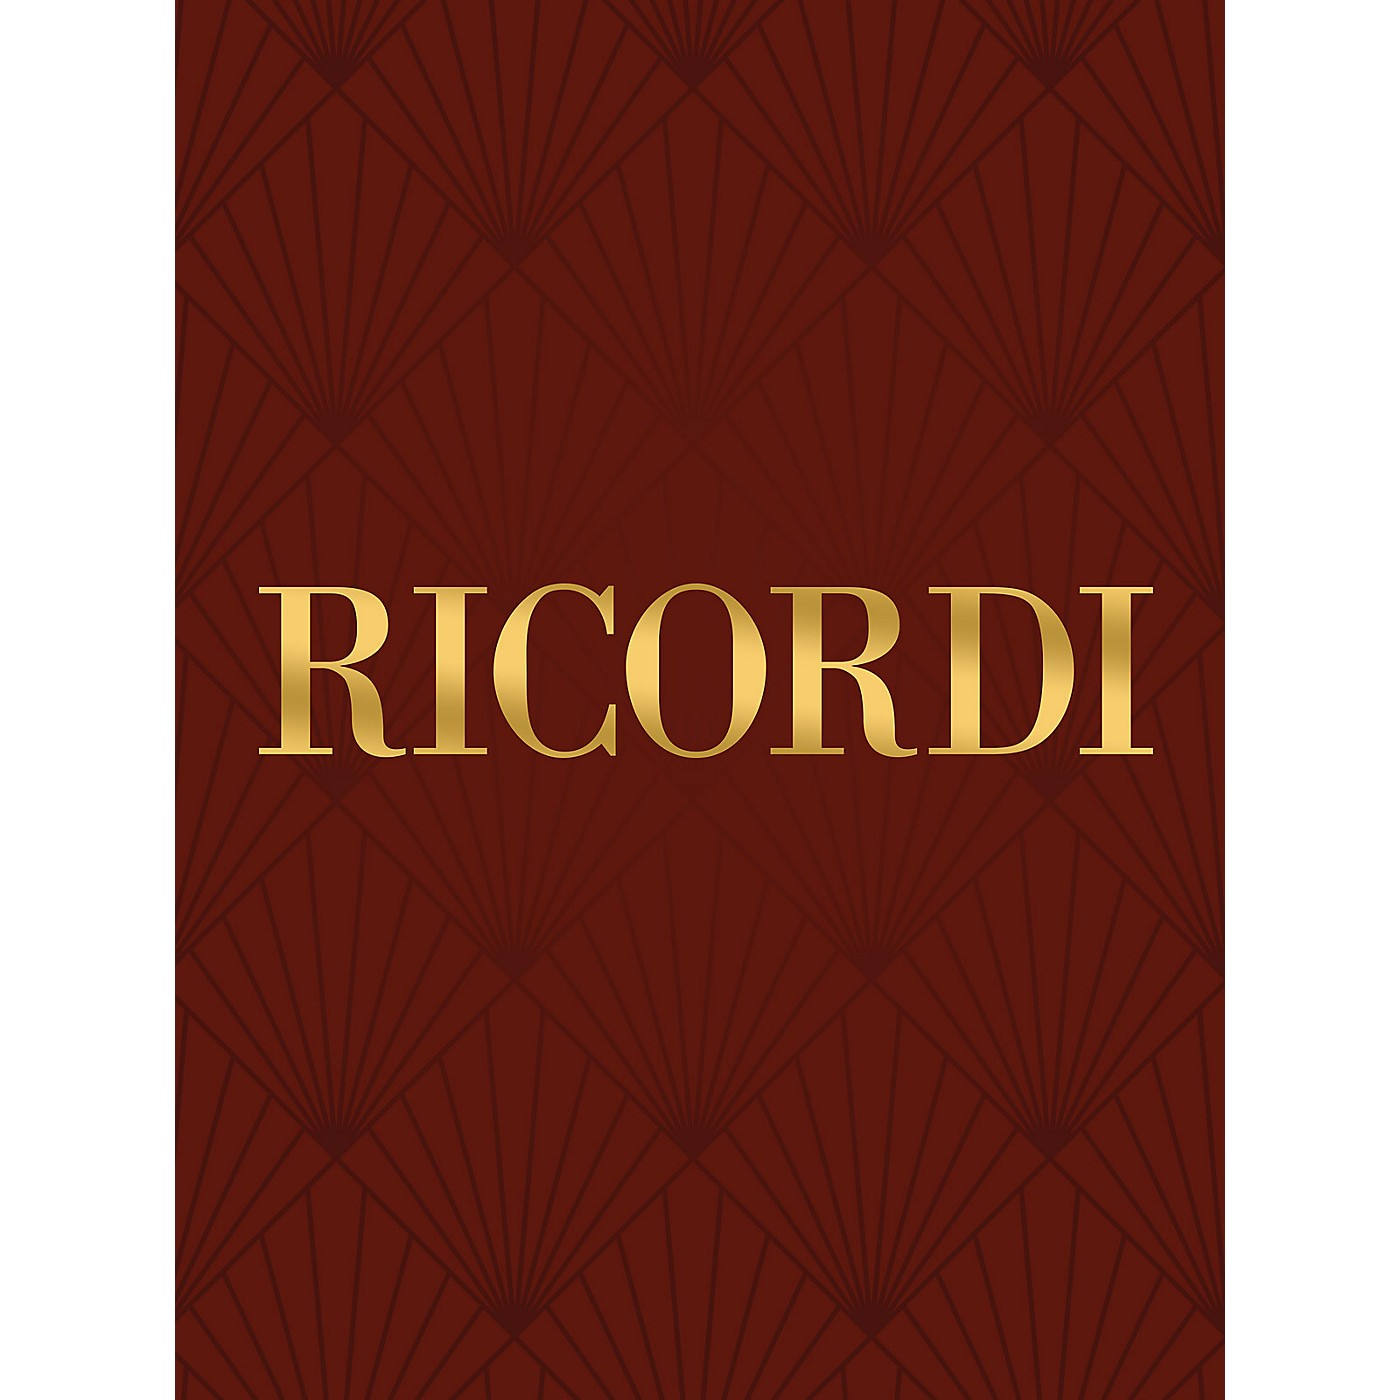 Ricordi 17 String Quartets (Miniature Full Score) Study Score Series Composed by Ludwig van Beethoven thumbnail